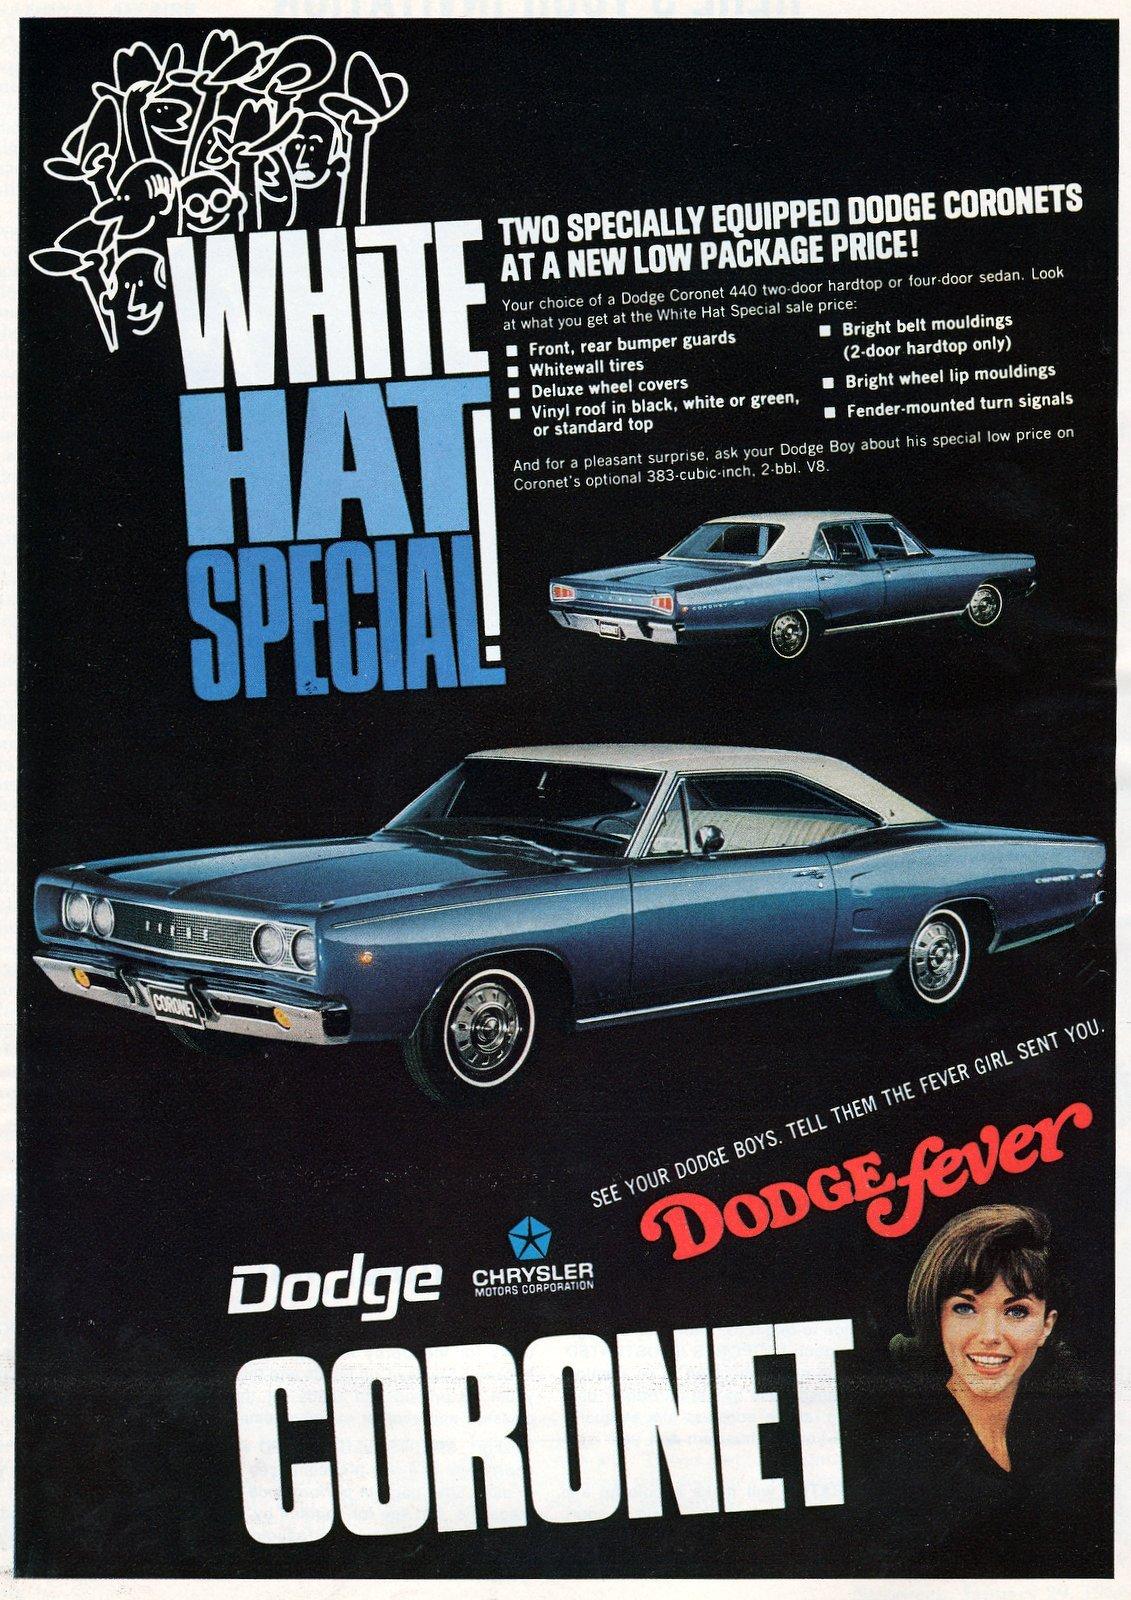 1968 Dodge Coronet cars